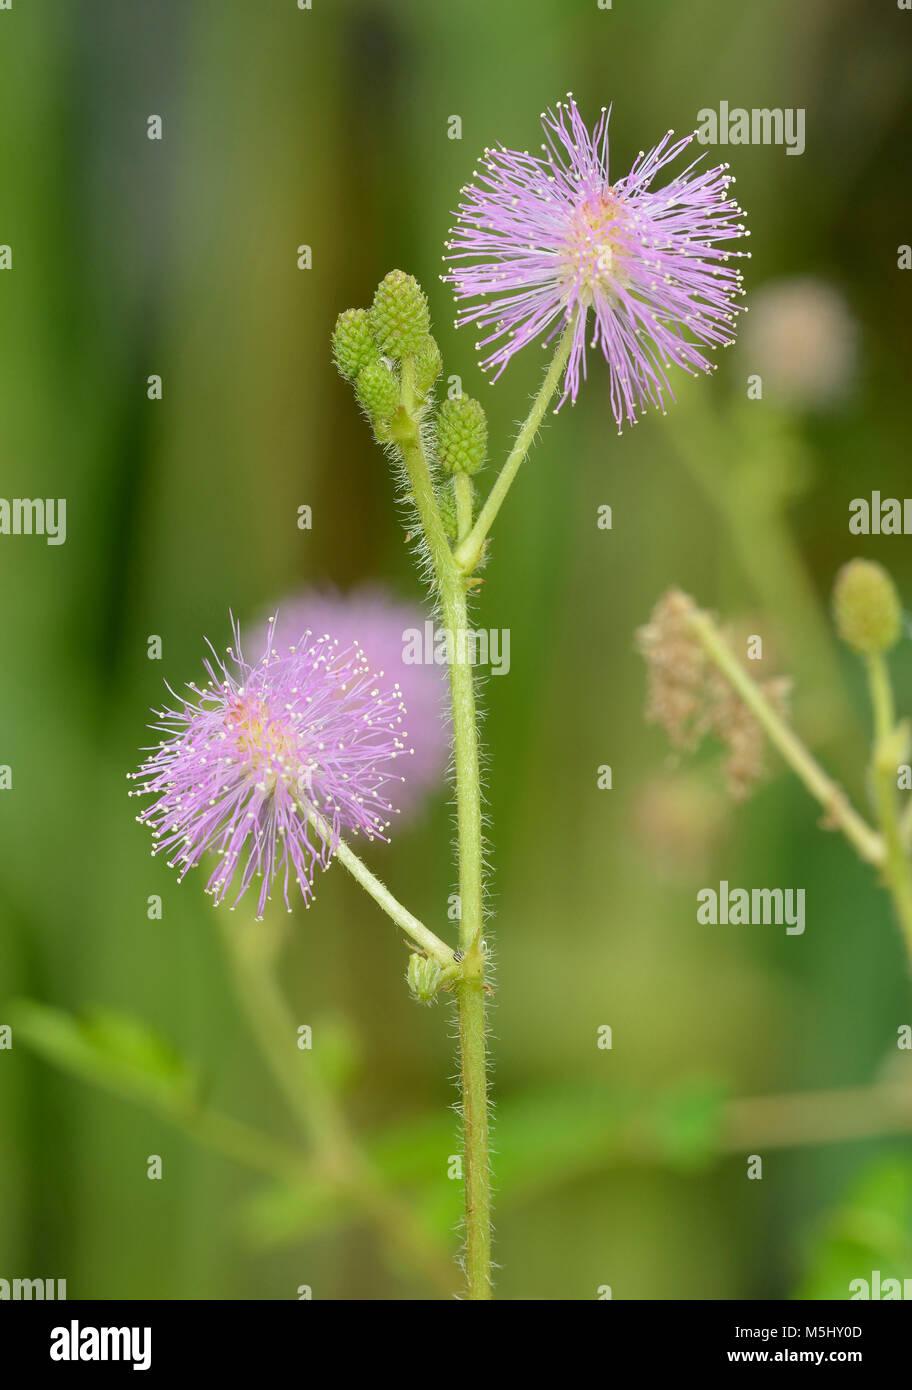 Sensitive Plant Seeds GardenSeedsMarket Mimosa pudica Mimosa